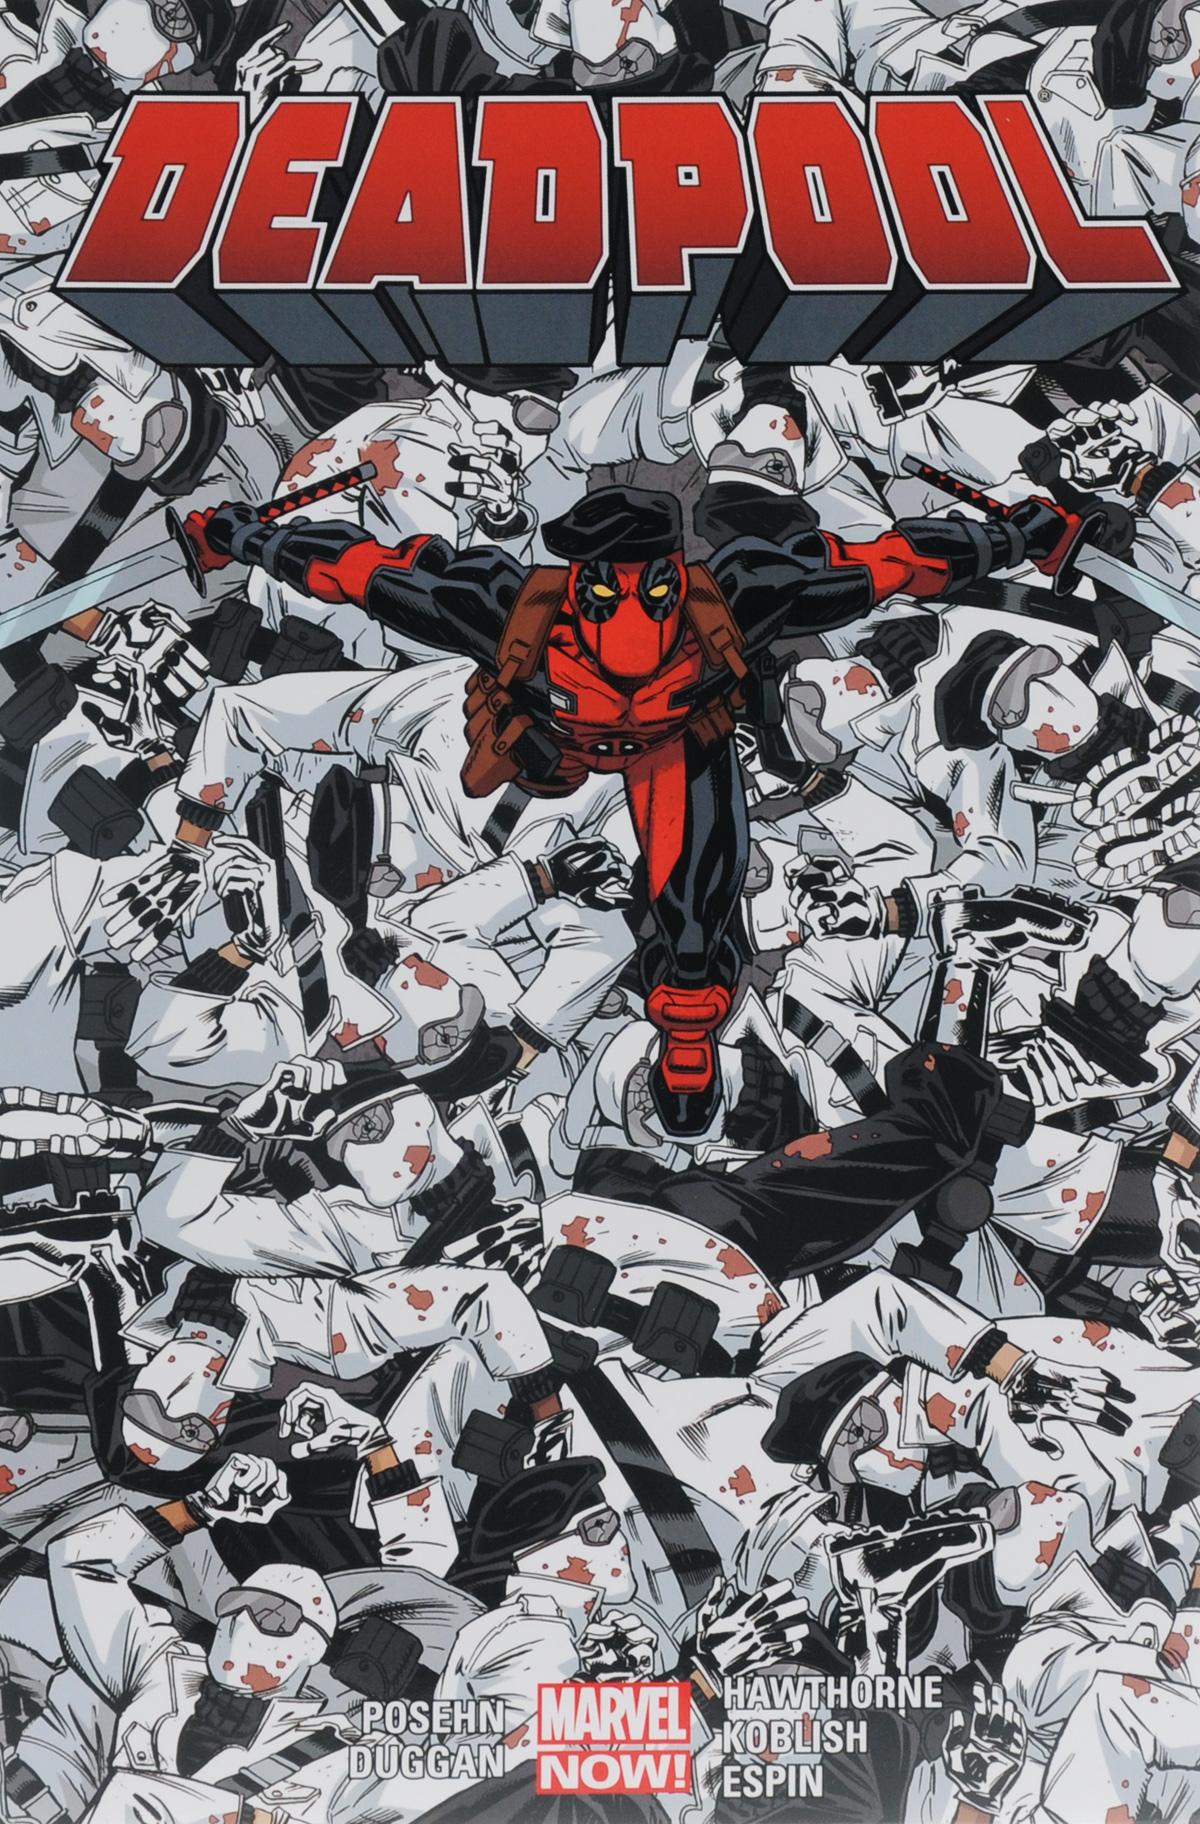 Deadpool by Posehn & Duggan Vol. 4 duggan gerry nova volume 5